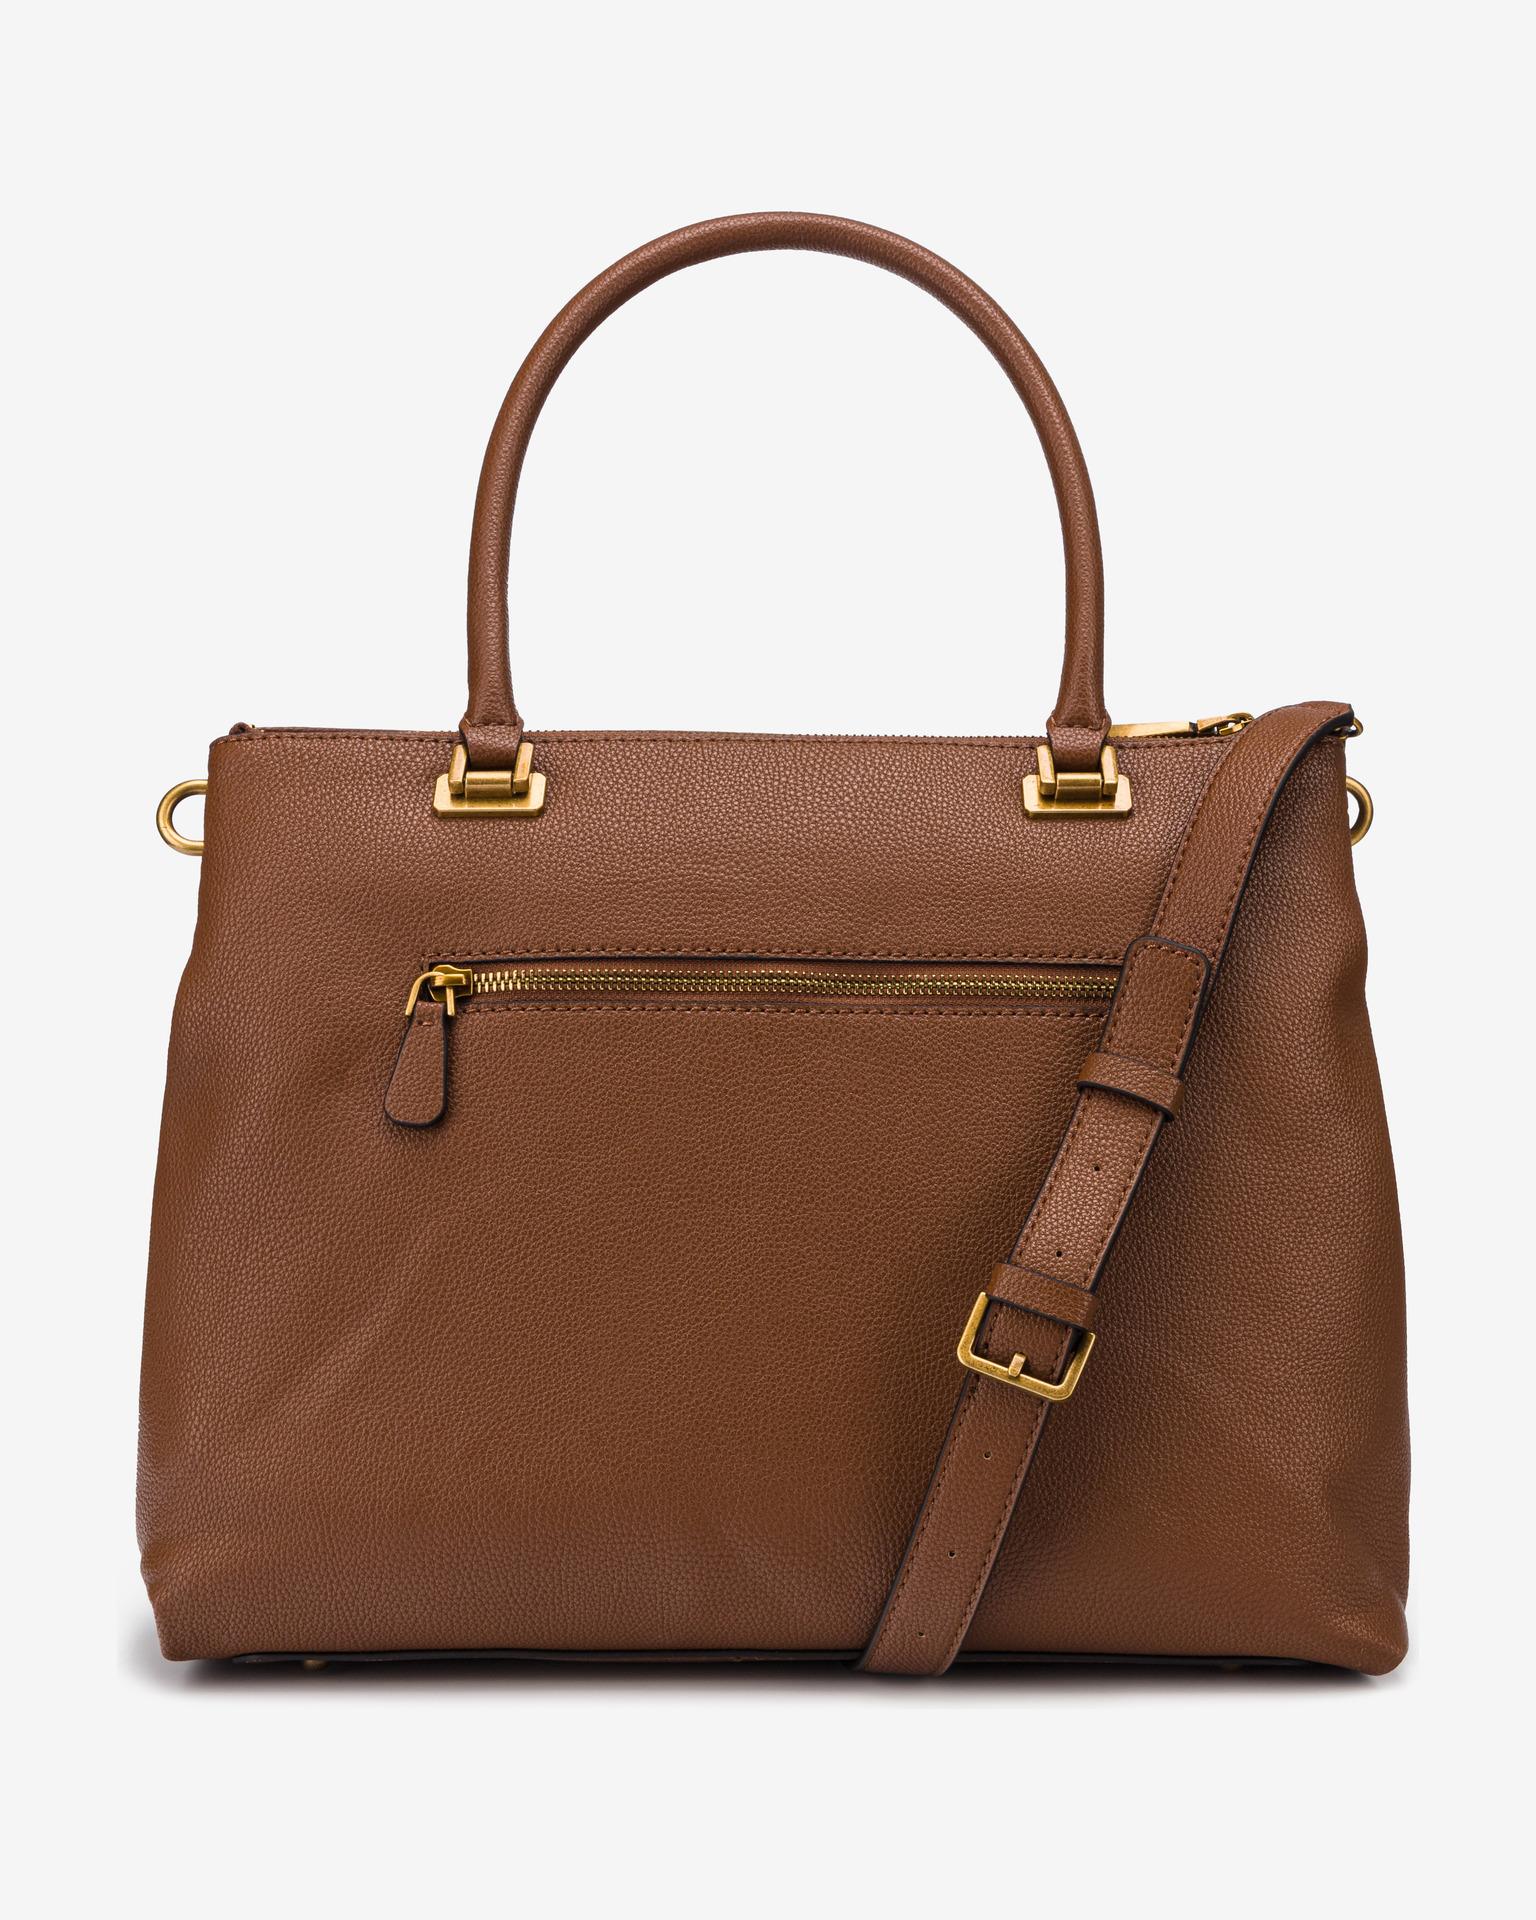 Guess brown handbag Destiny Society